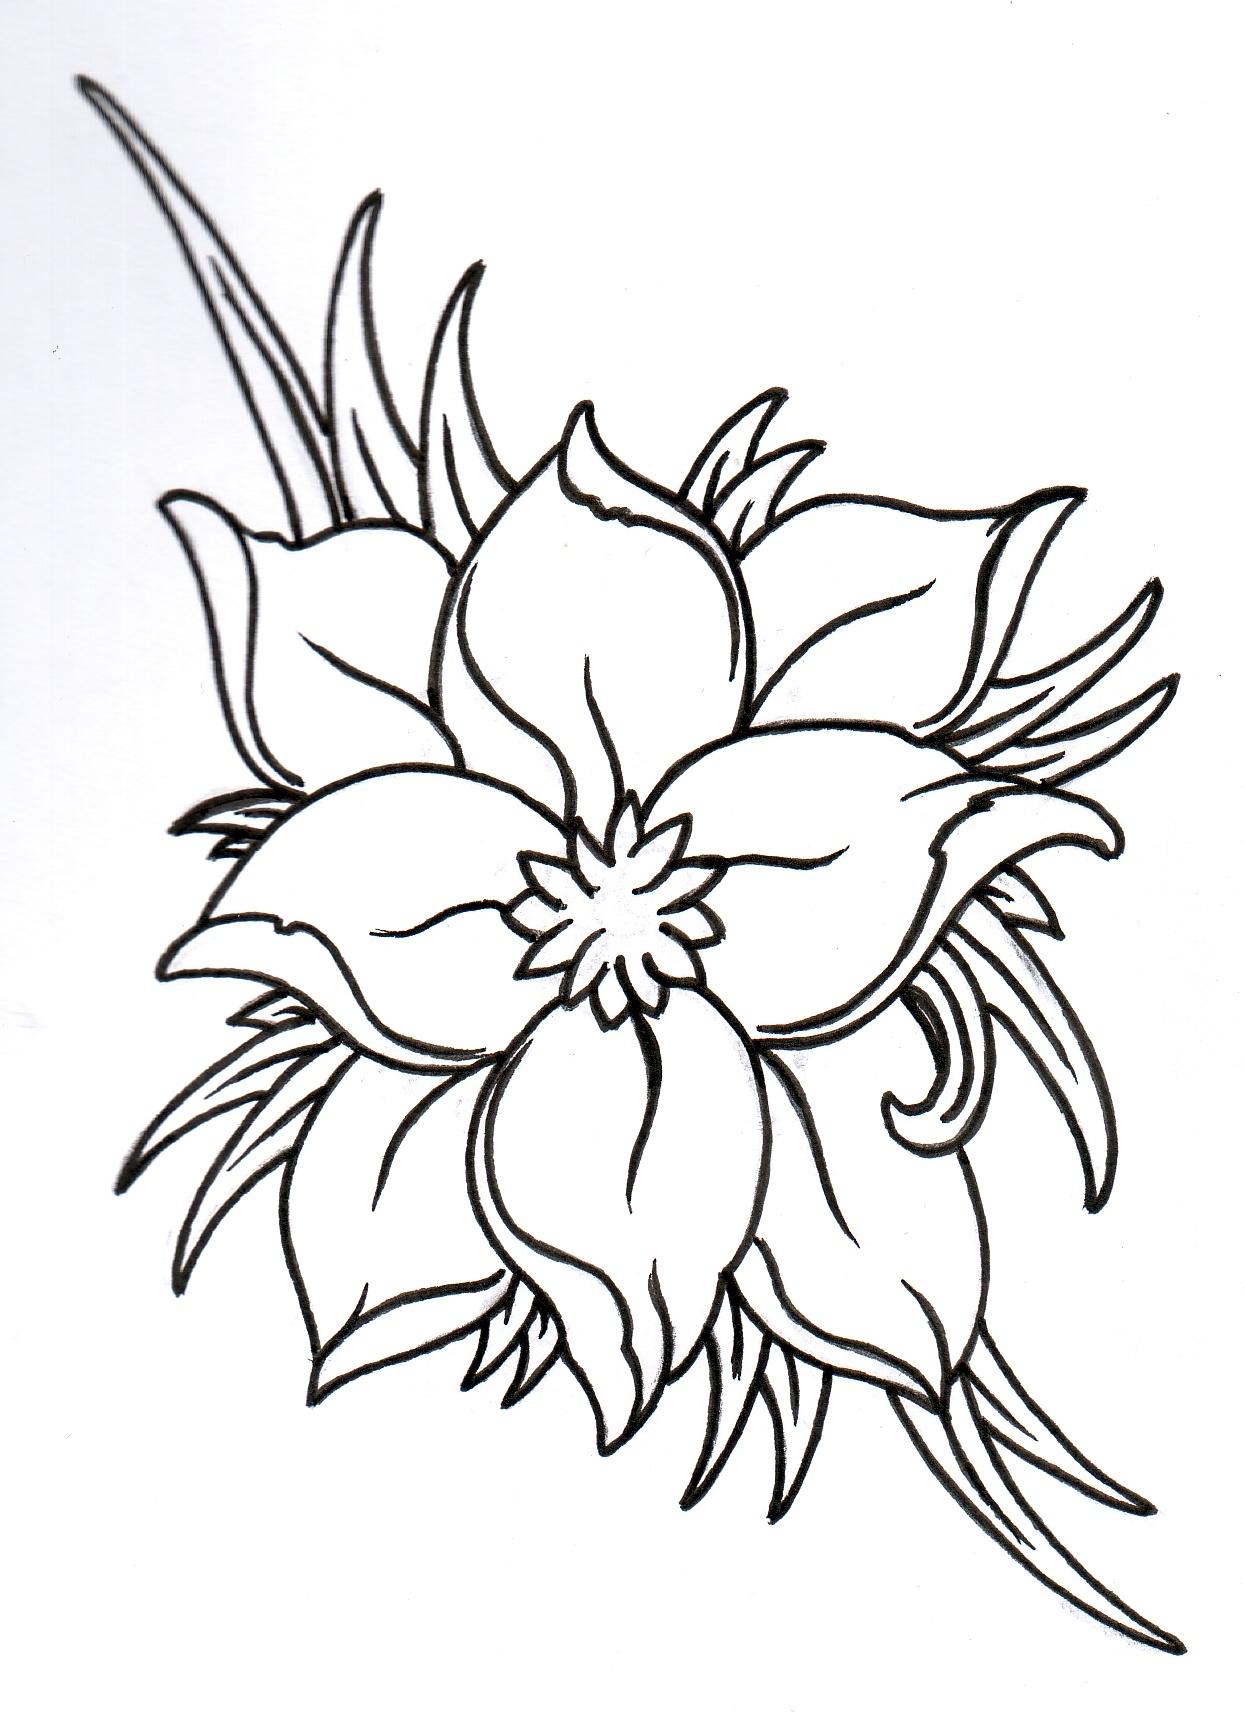 Lotus Flower Tattoo Outline Free Image